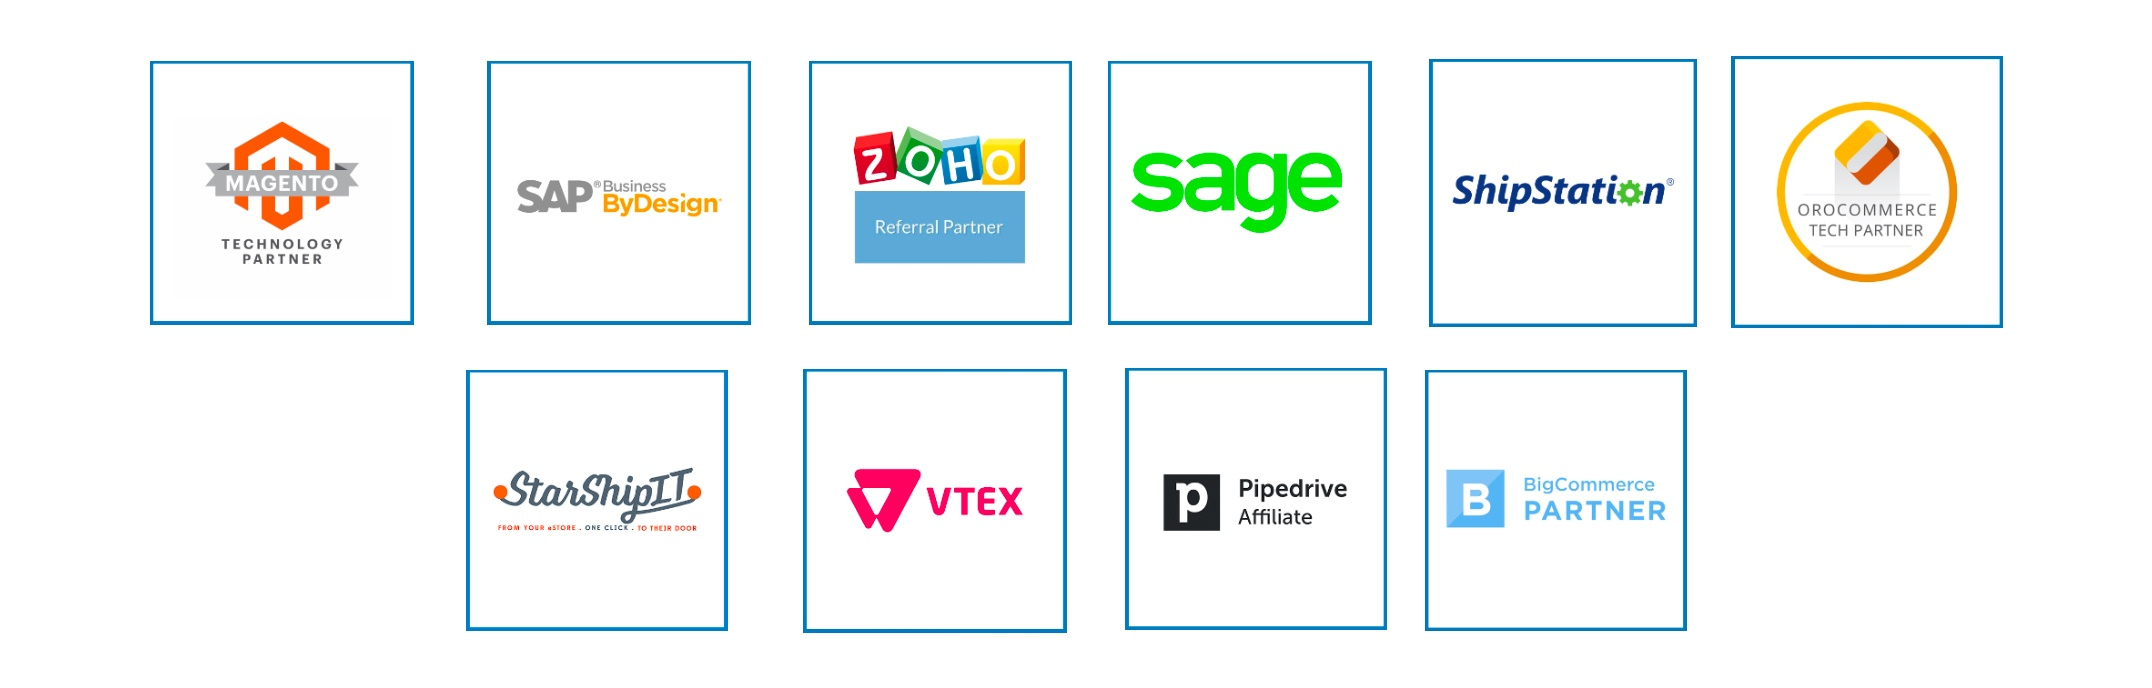 APPSeCONNECT-Affiliations-2018